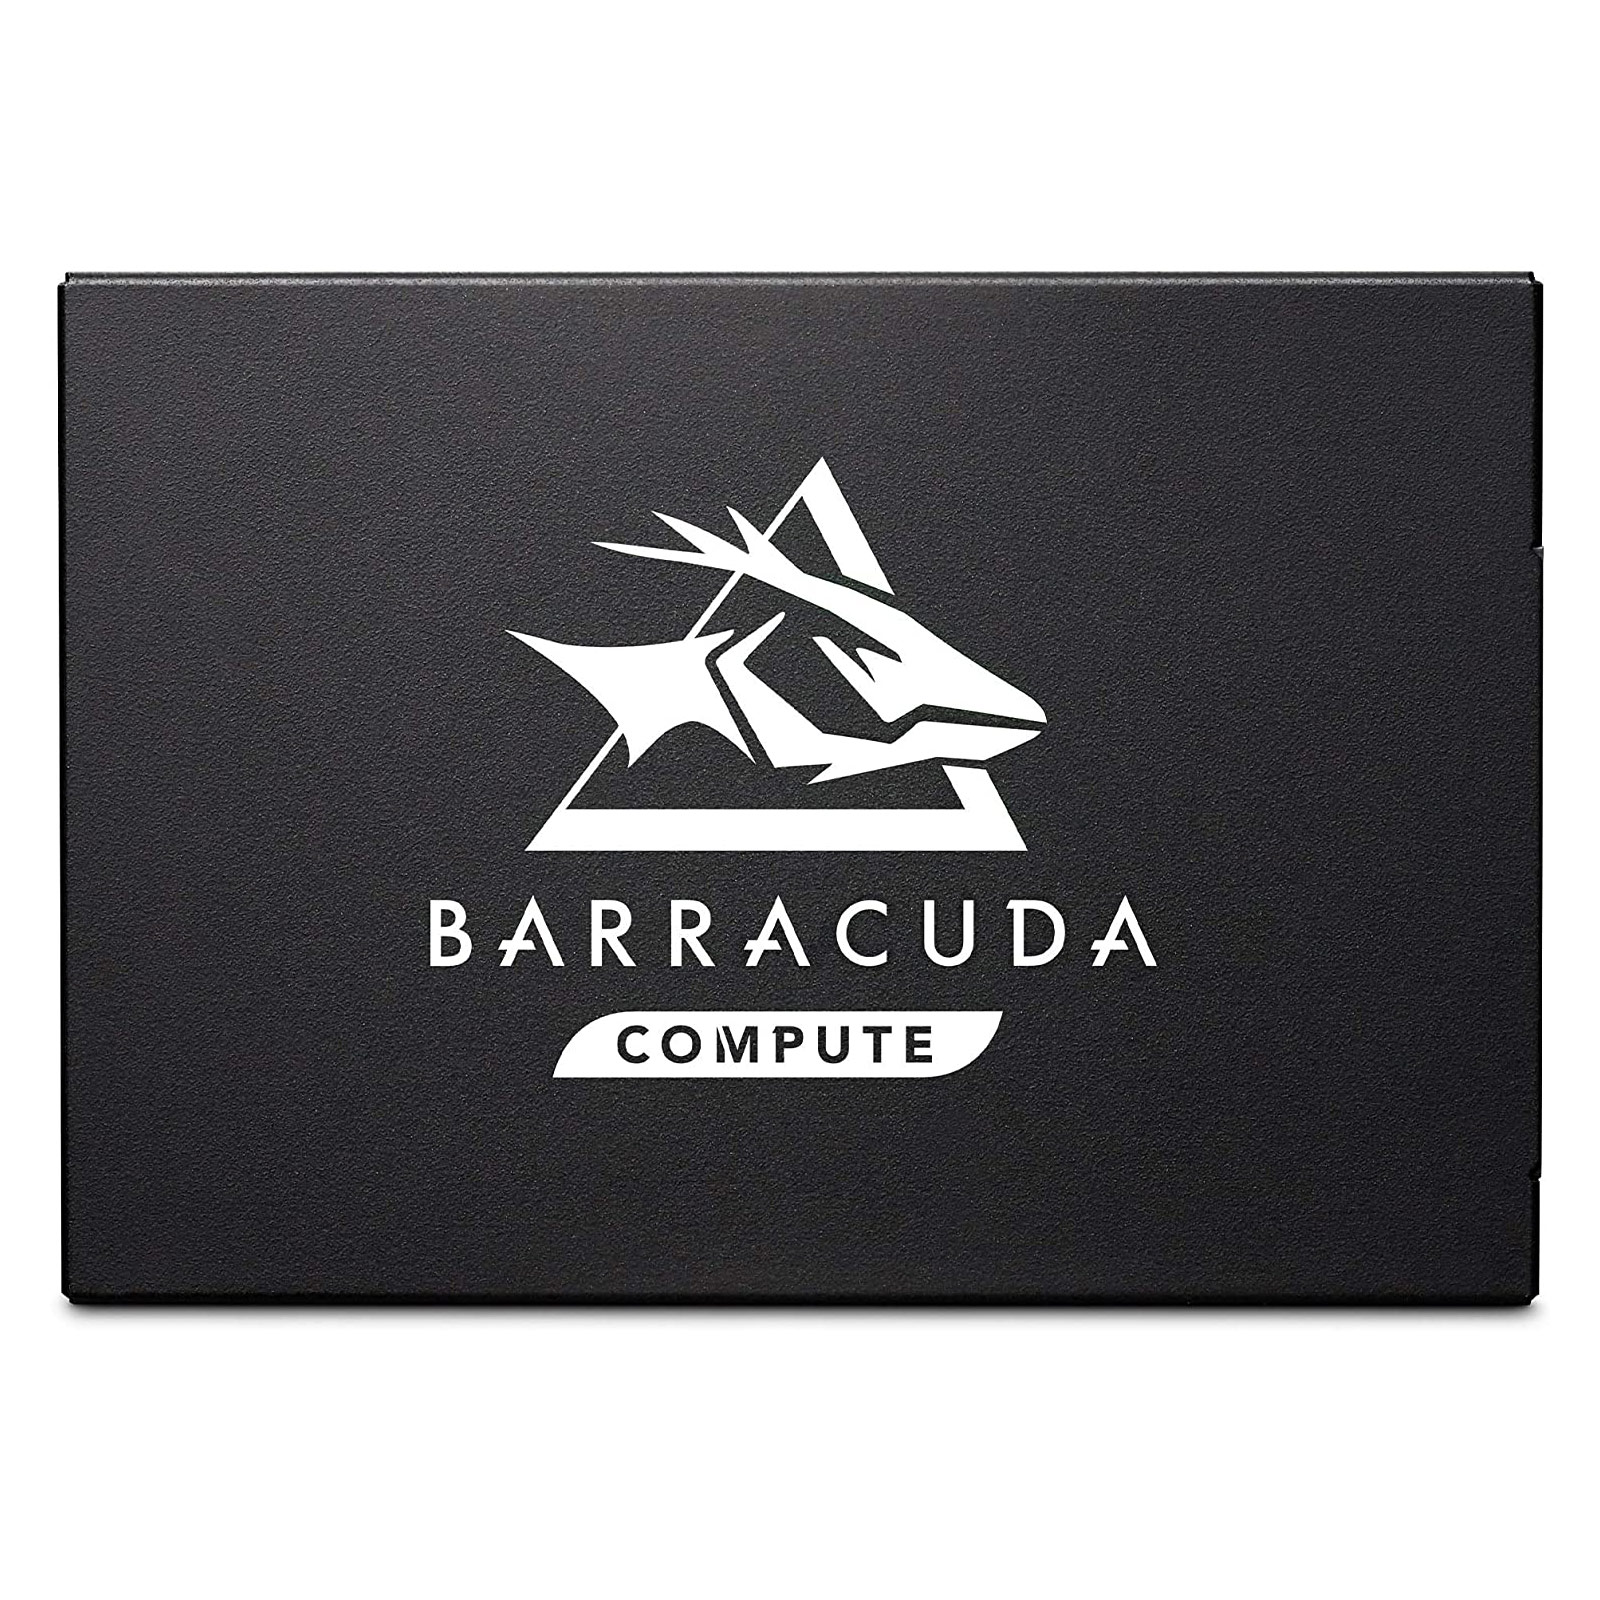 Disque SSD Barracuda Q1 480 Go Seagate